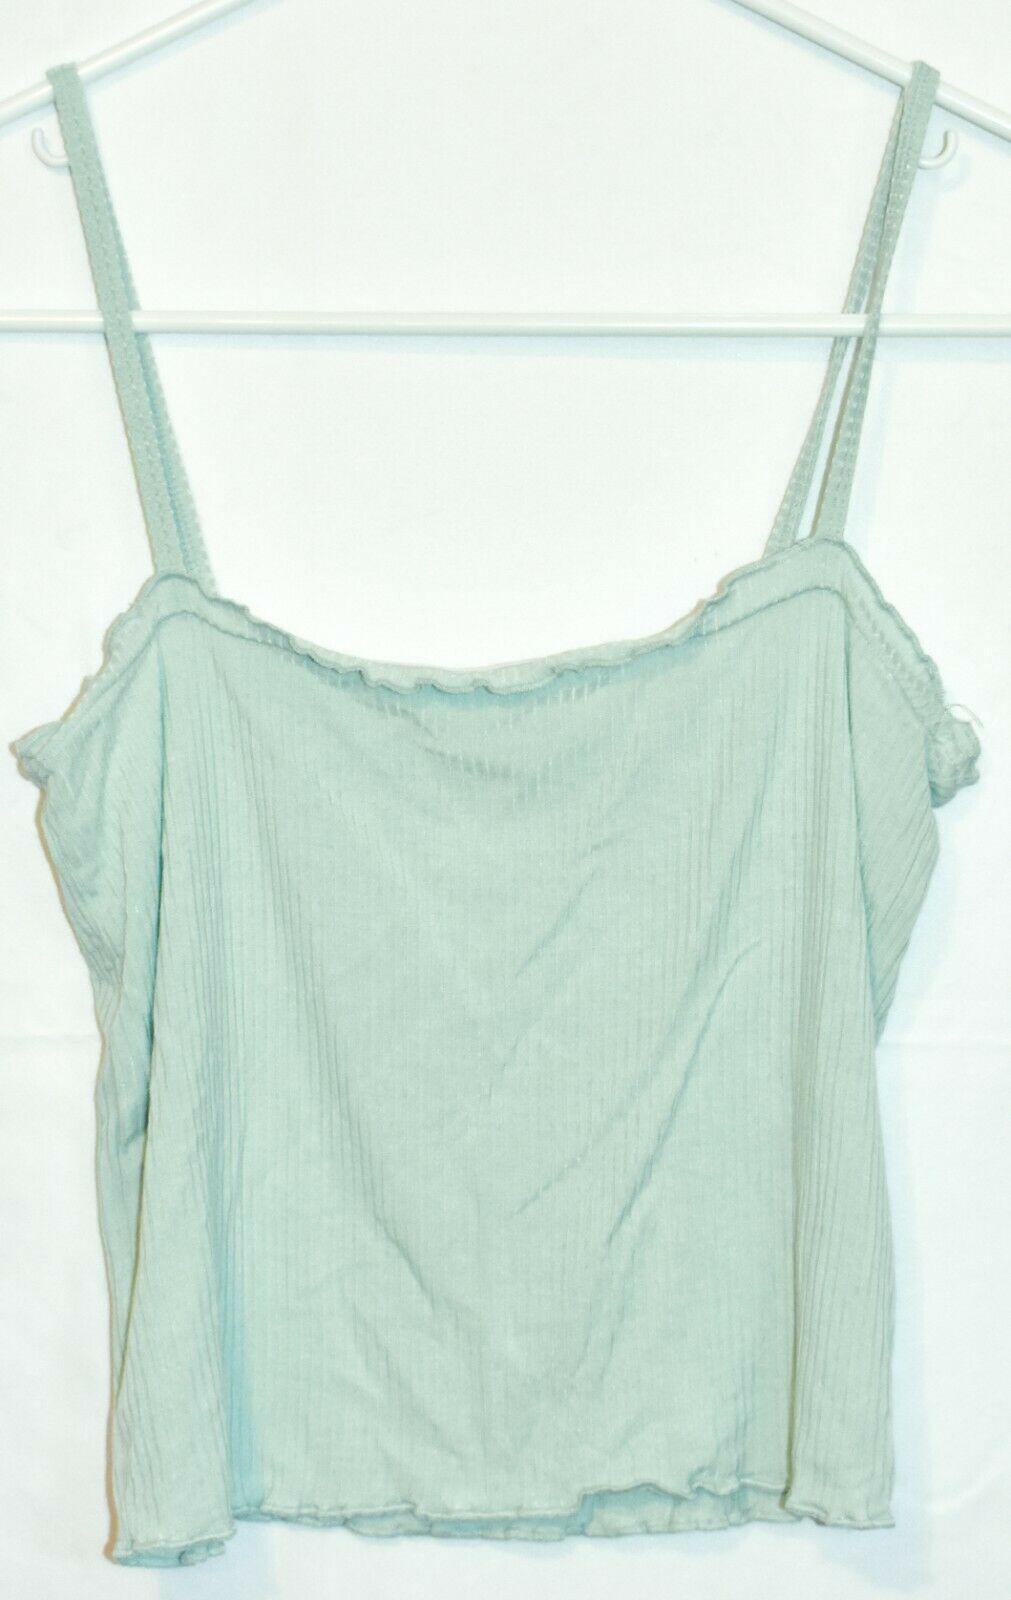 PS Basics Pacsun Women's Seafoam Green Ruffle Ribbed Knit Crop Tank Top Size S